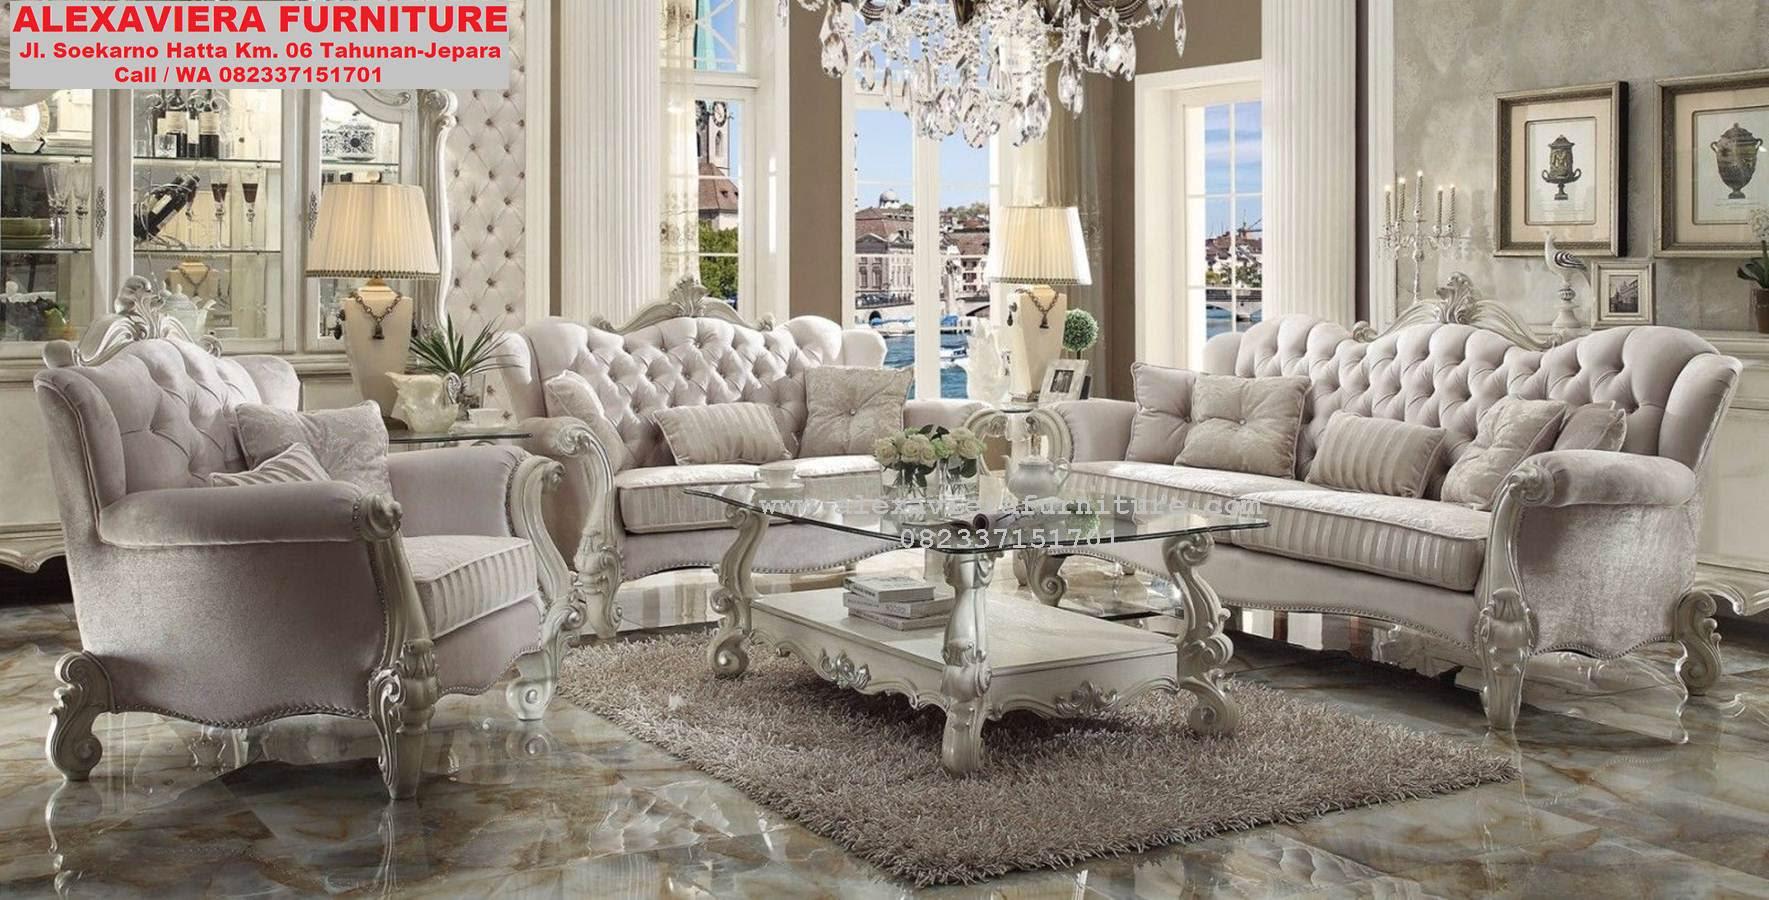 Sofa Ruang Keluarga Modern Terbaru 2017 KT 051 Sofa Murah Sofa